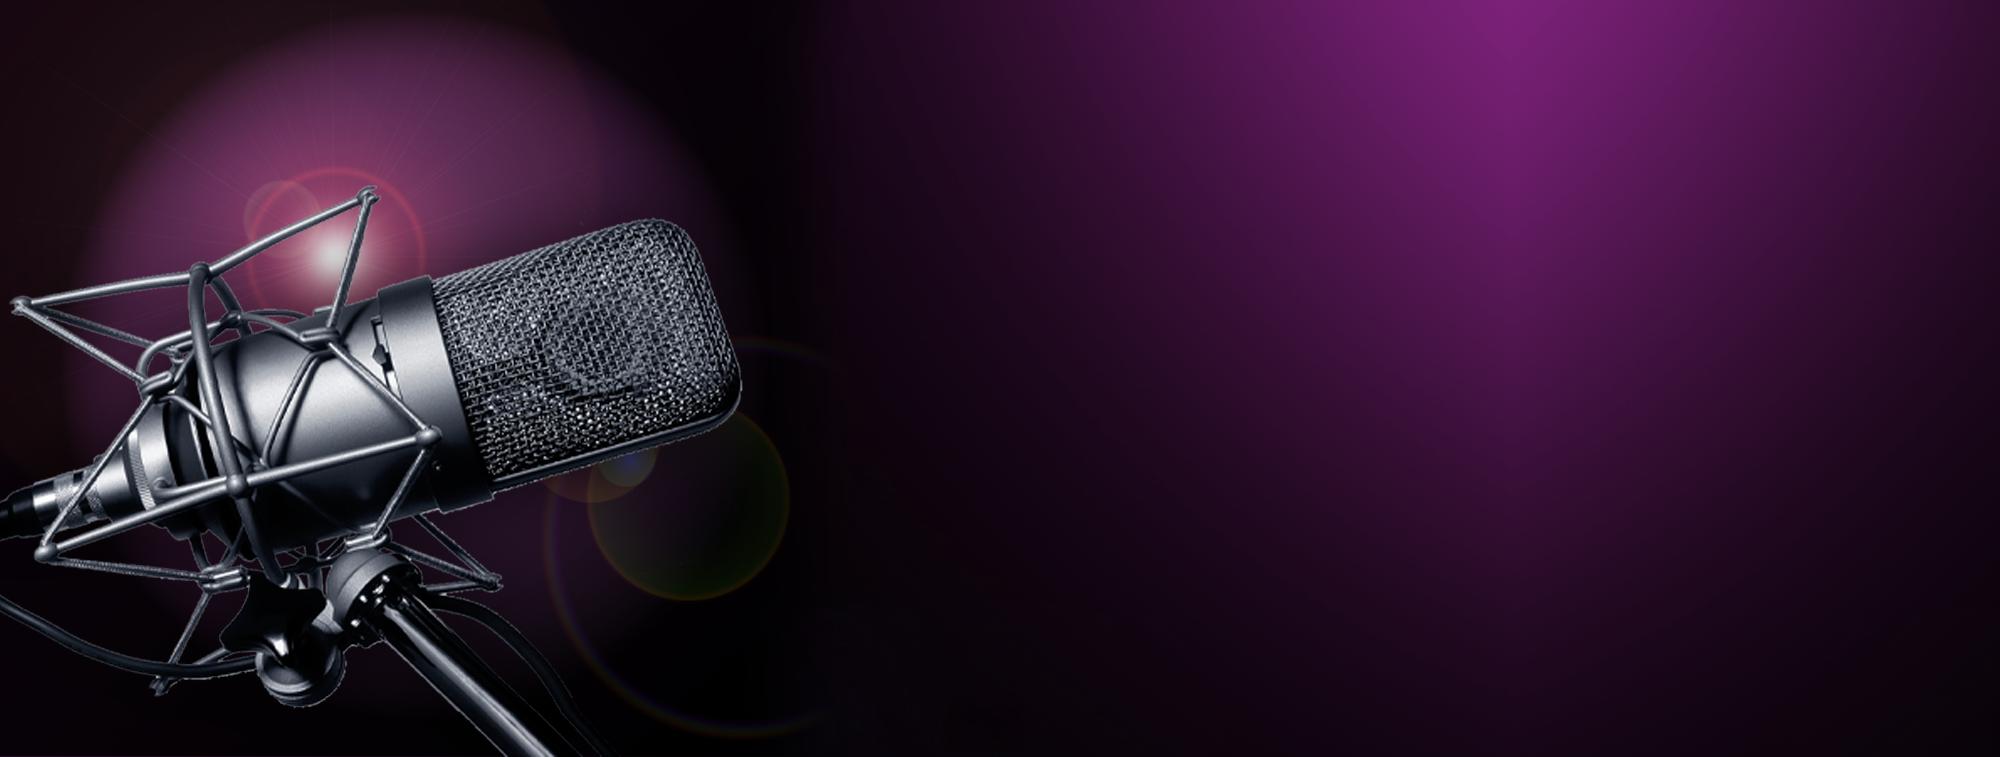 Microfono-1-Fondo